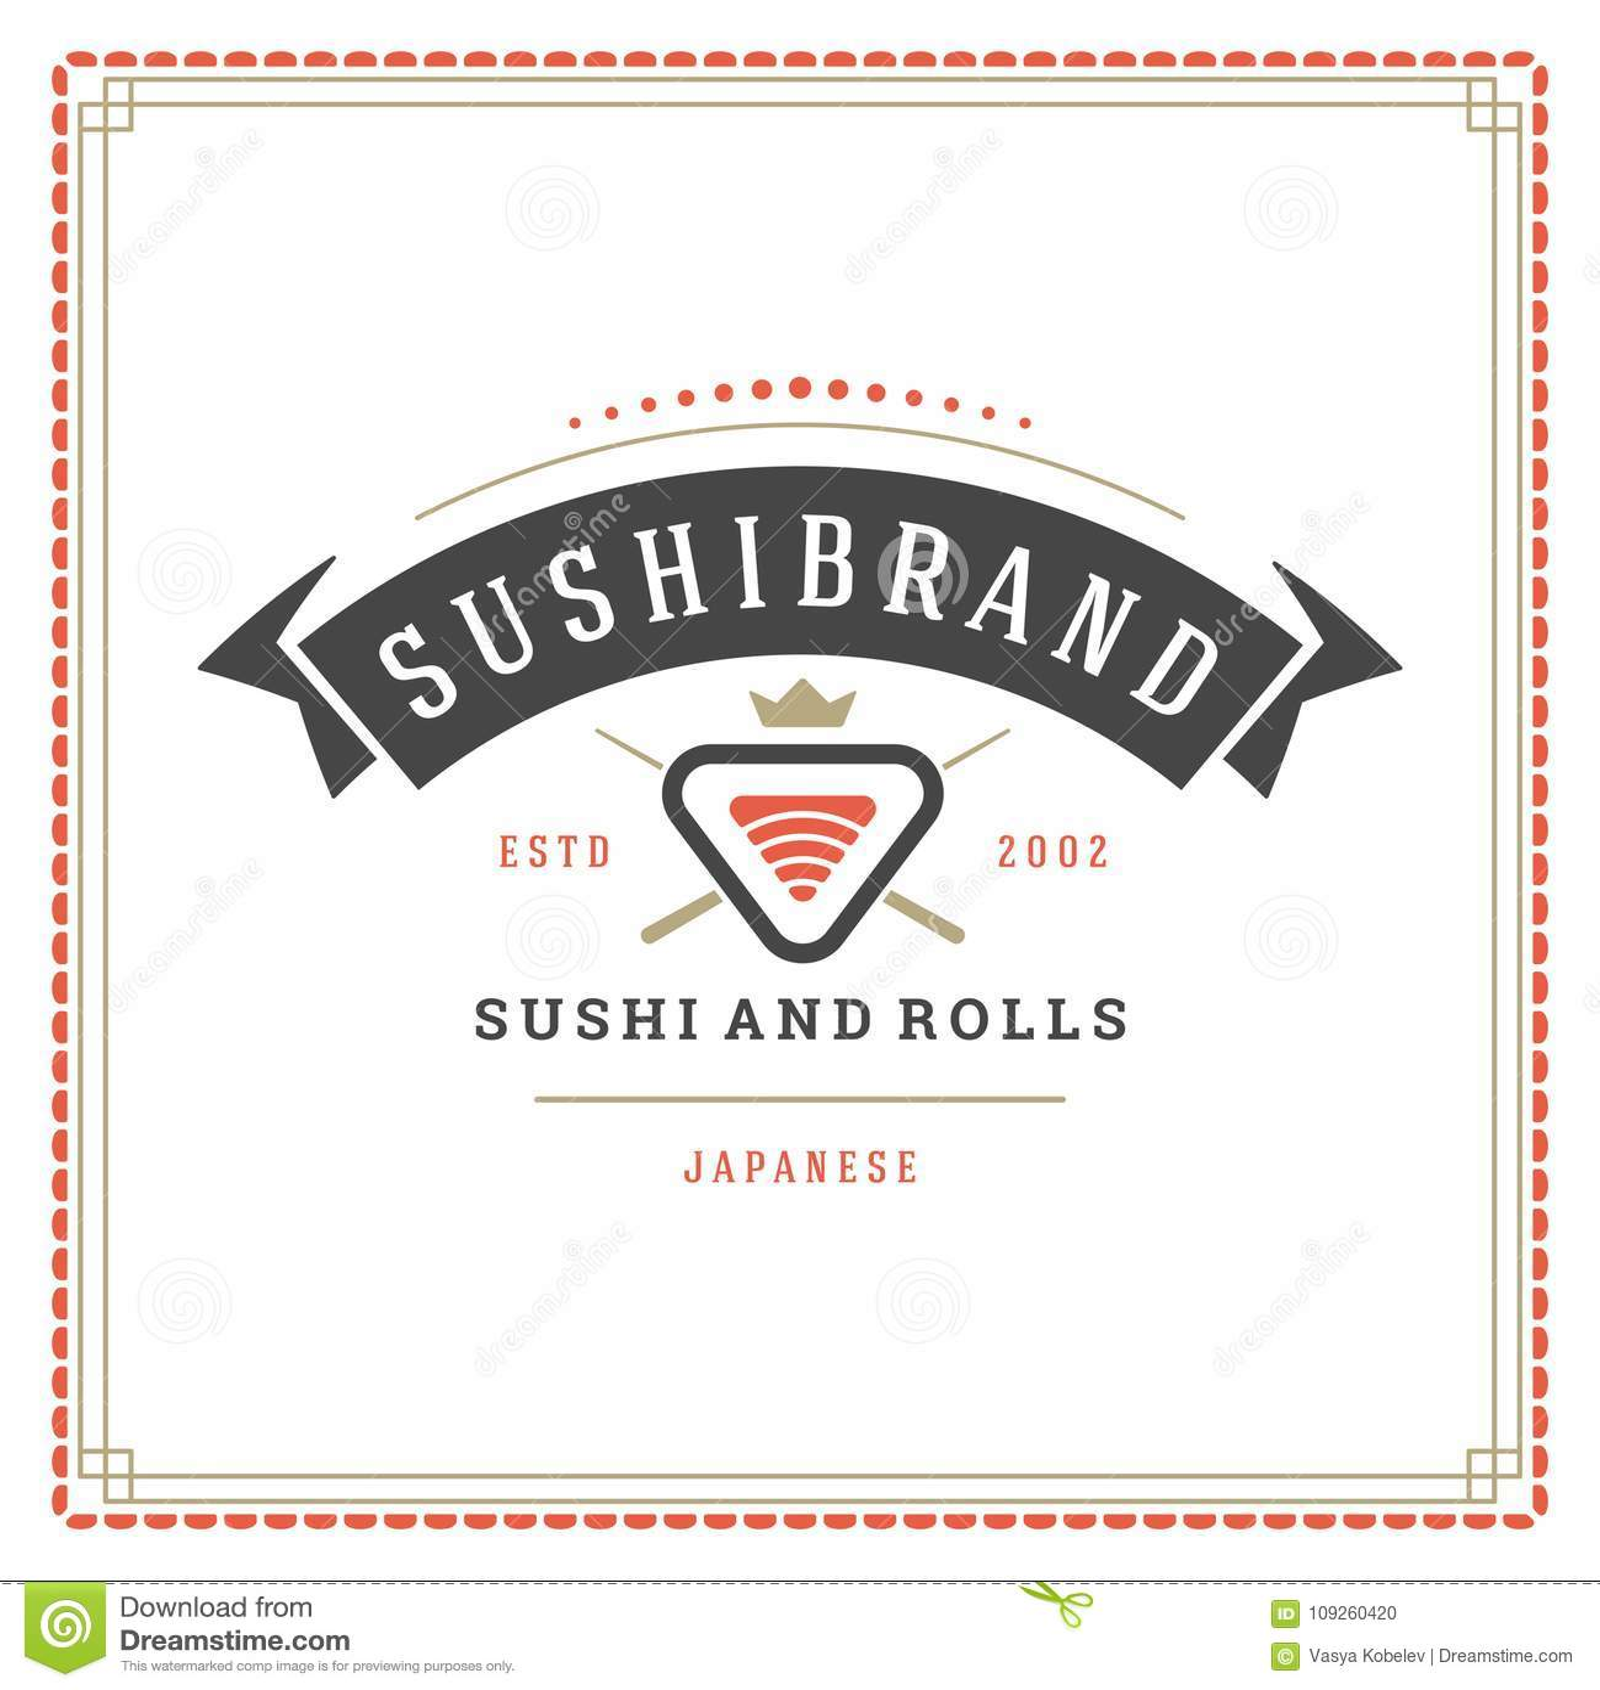 Sushi restaurant logo vector illustration.